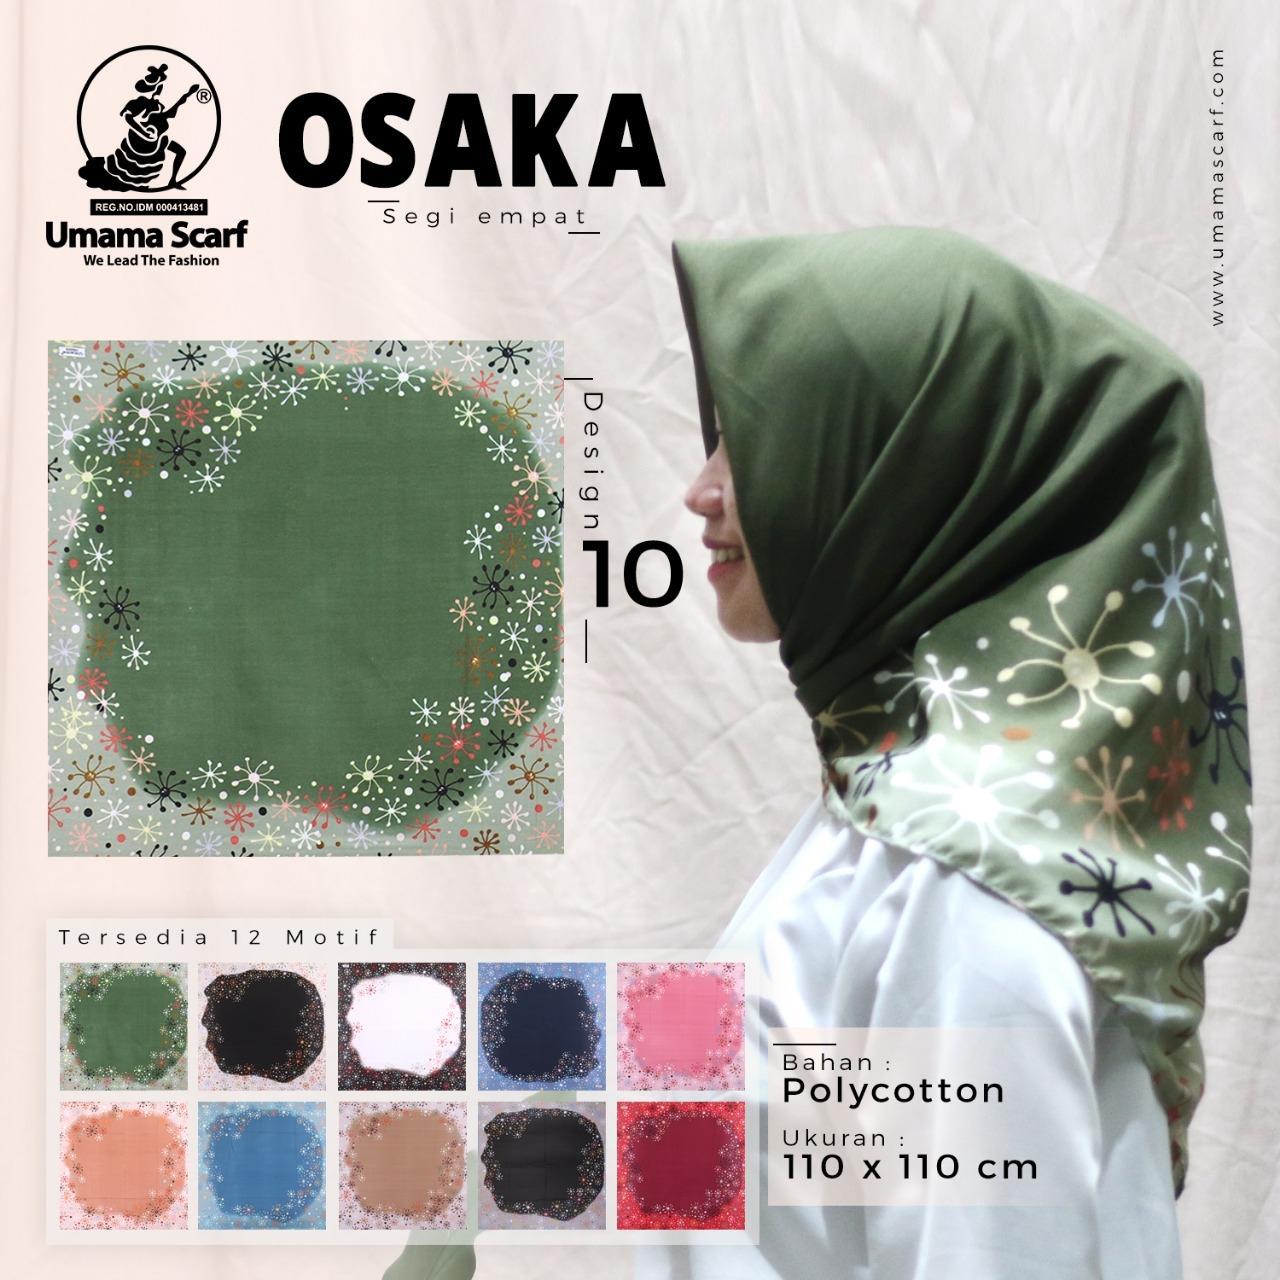 Promo!!! hijab segi empat Osaka polycotton terbaru, termurah